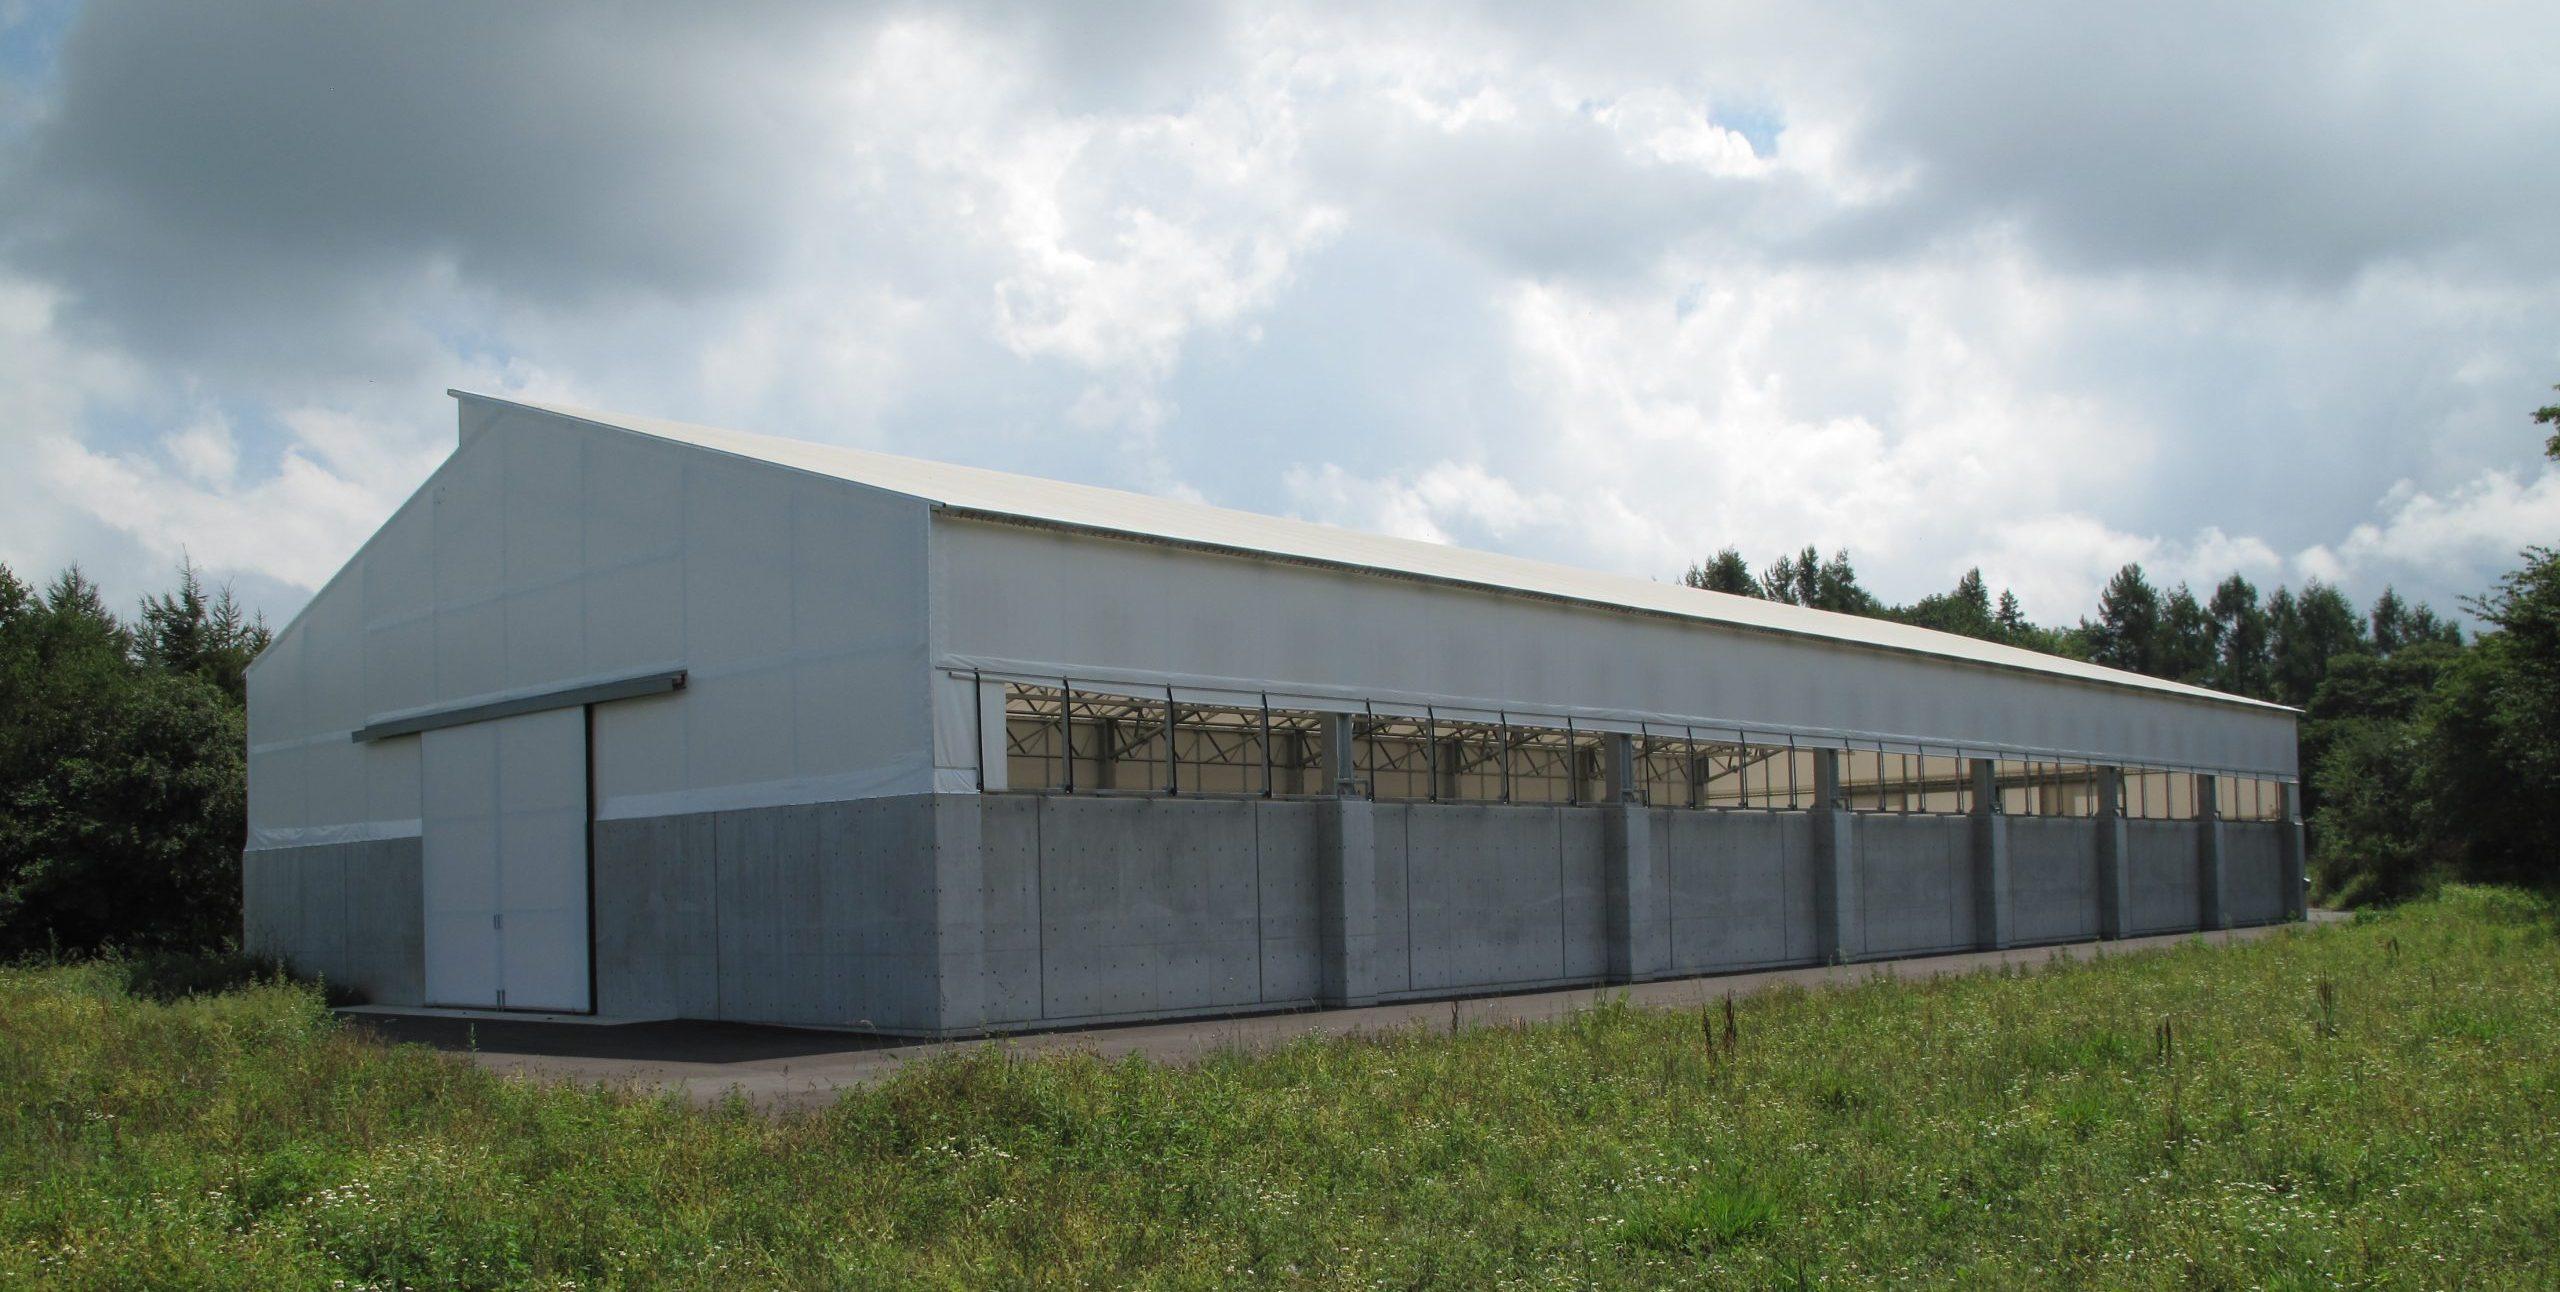 長和町生ごみ堆肥化処理施設